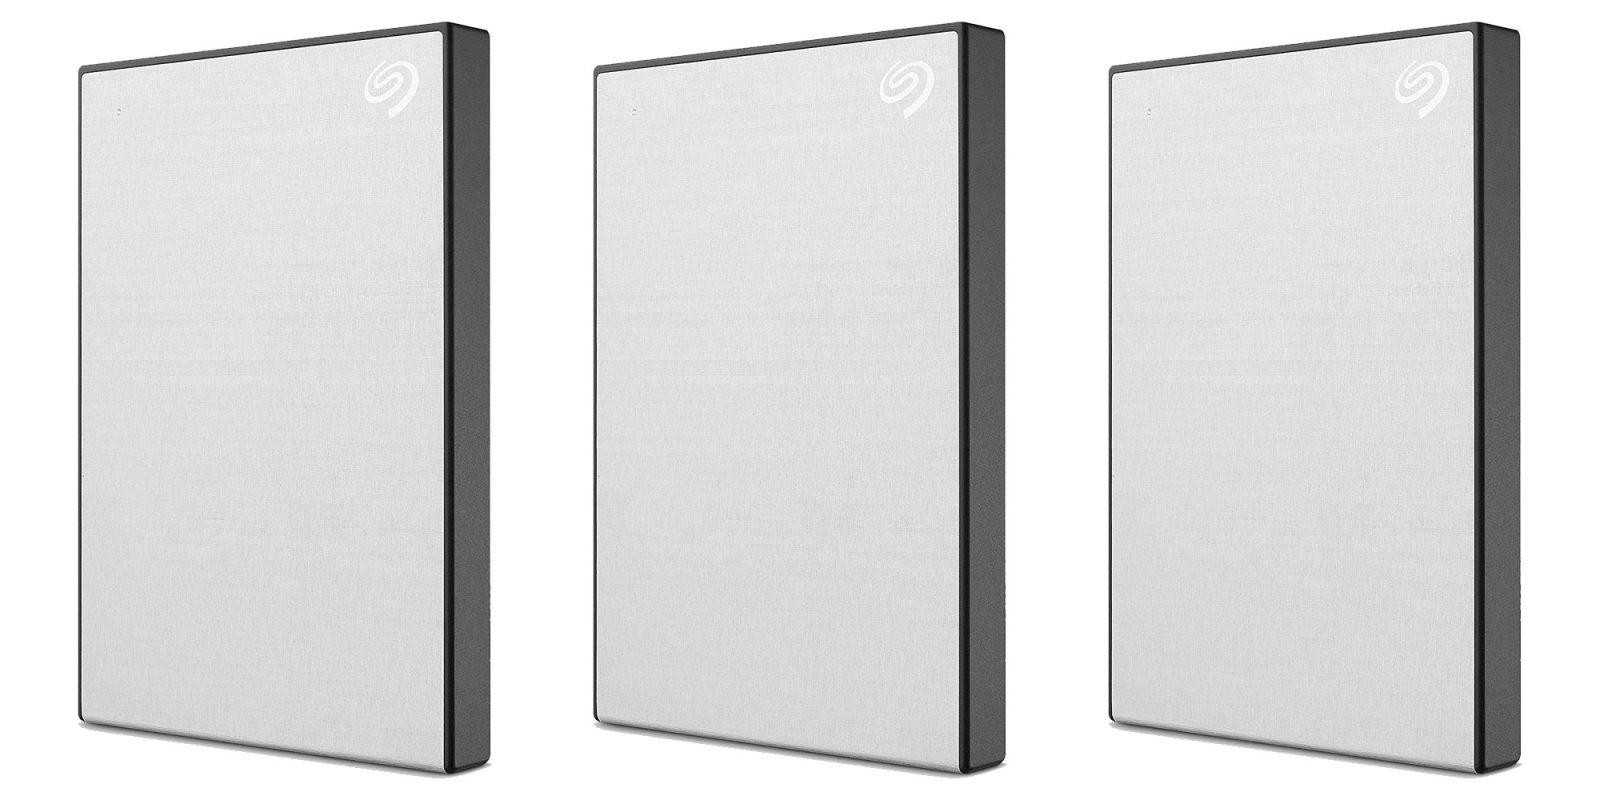 Seagate's 2TB portable HDD bundles 2-months of Creative Cloud: $55 (Reg. $70+)